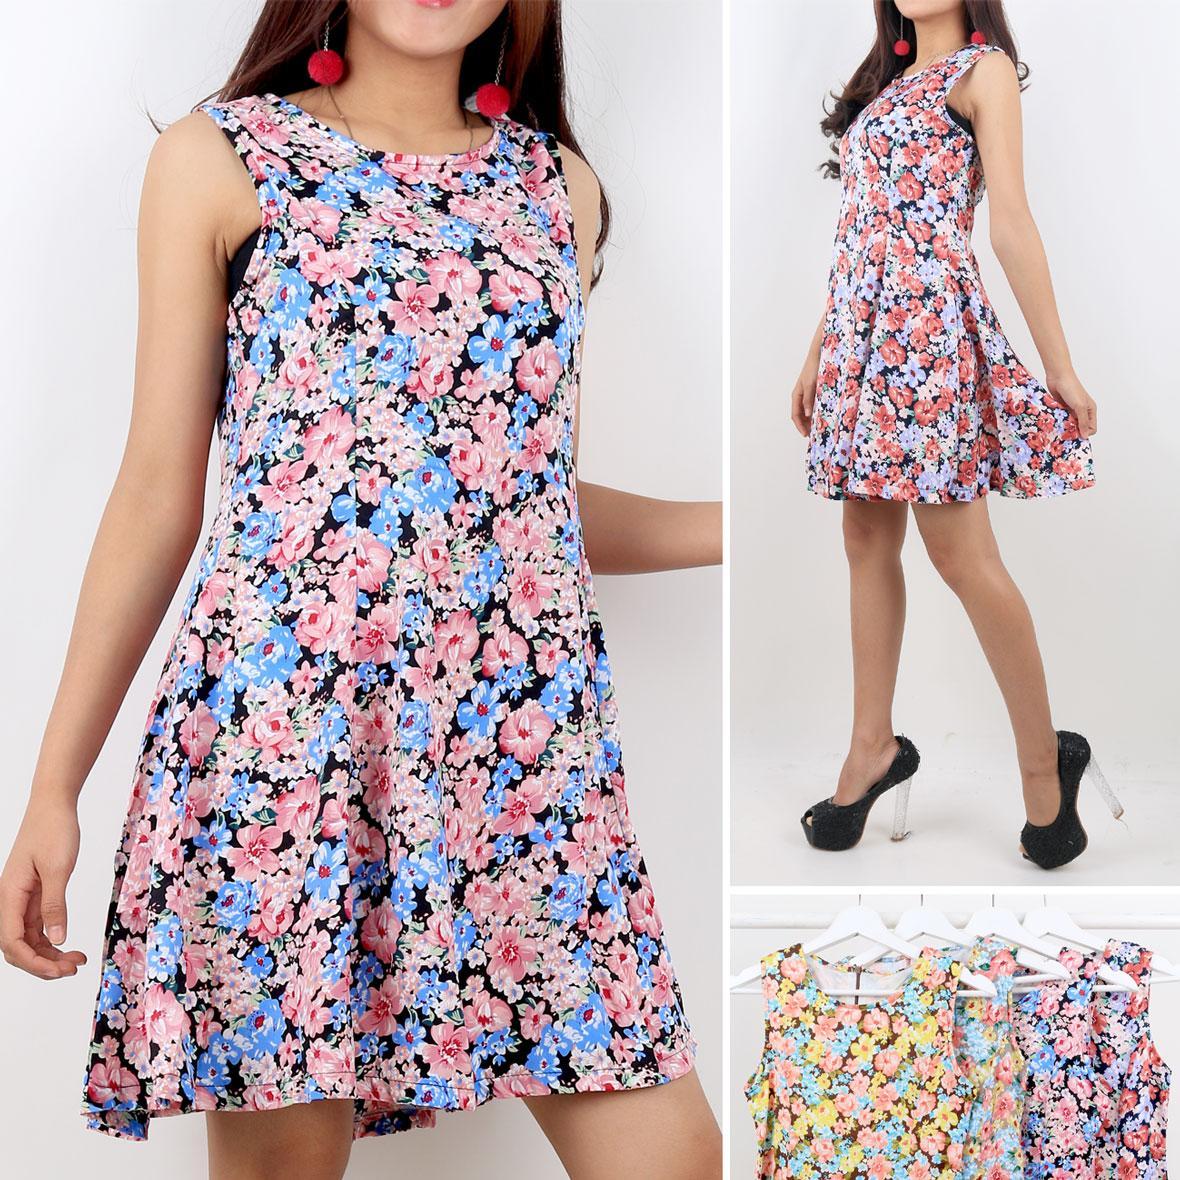 Oma Holley Fashion Aubrei Mini Dress Flowers Sleeveless 4 Warna-Size M